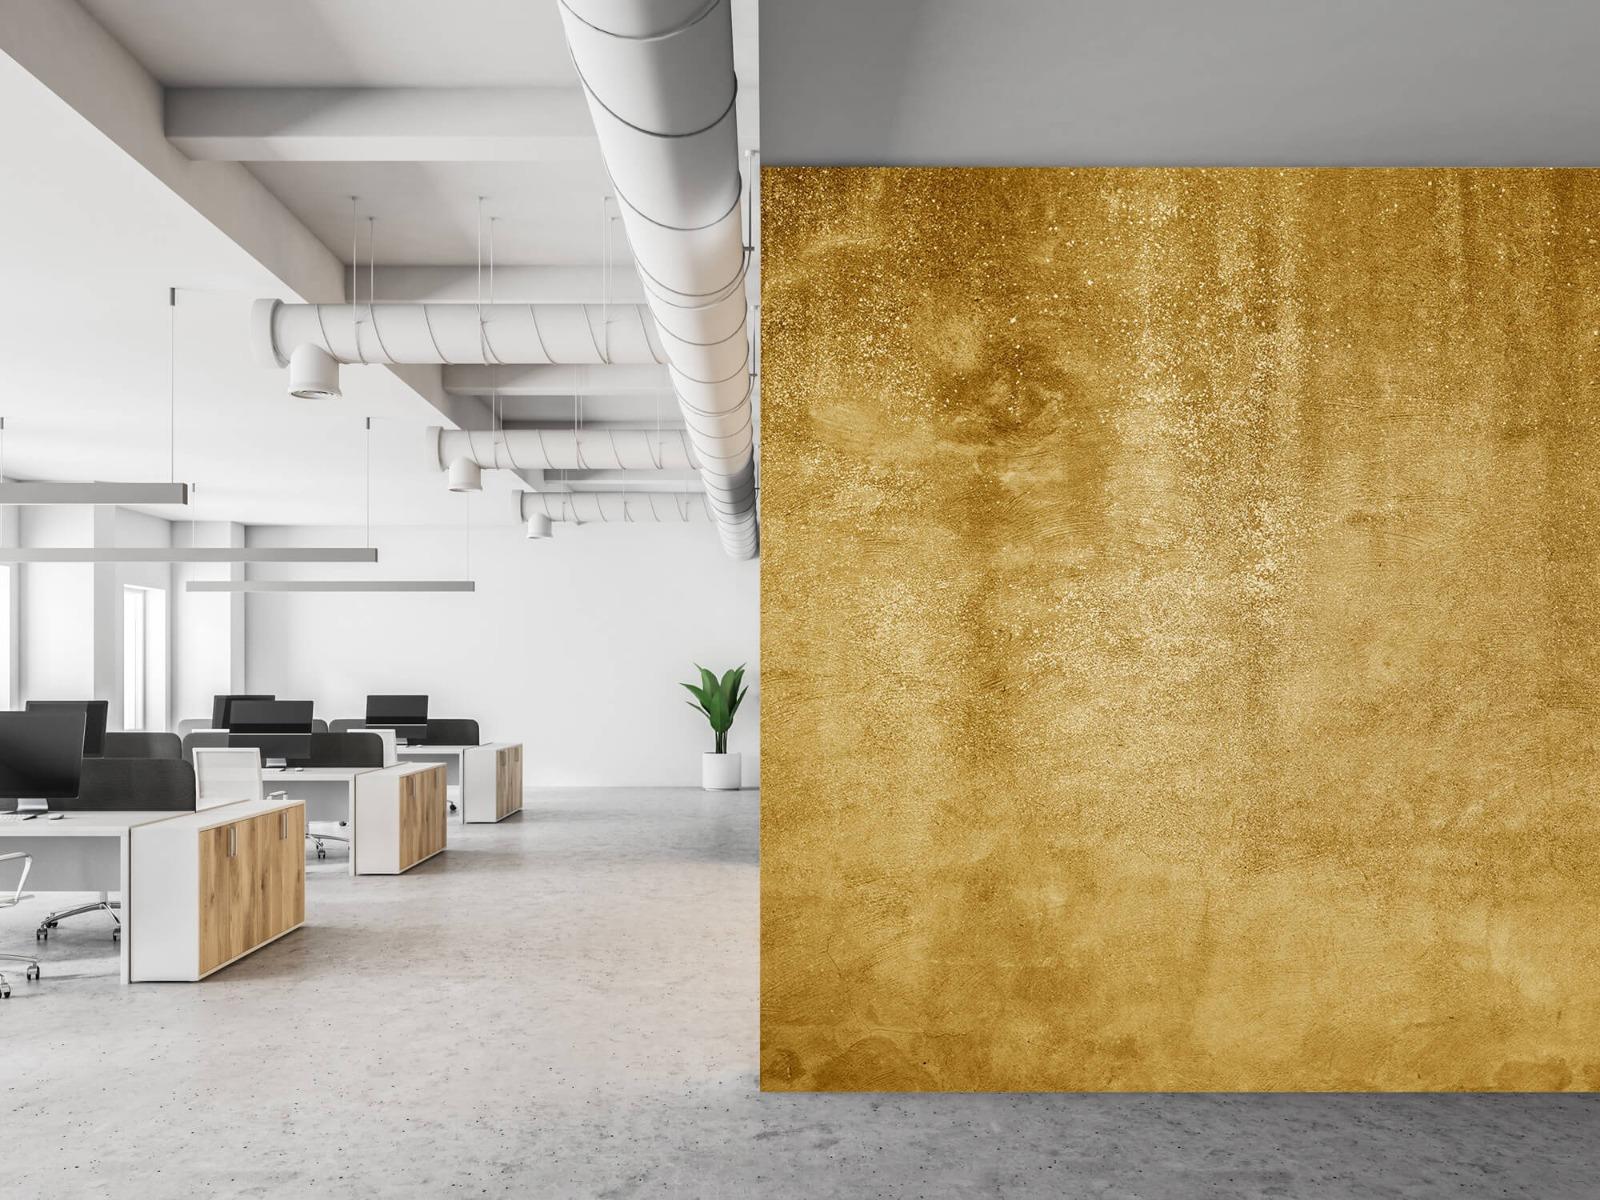 Betonlook behang - Oker geel beton - Woonkamer 21